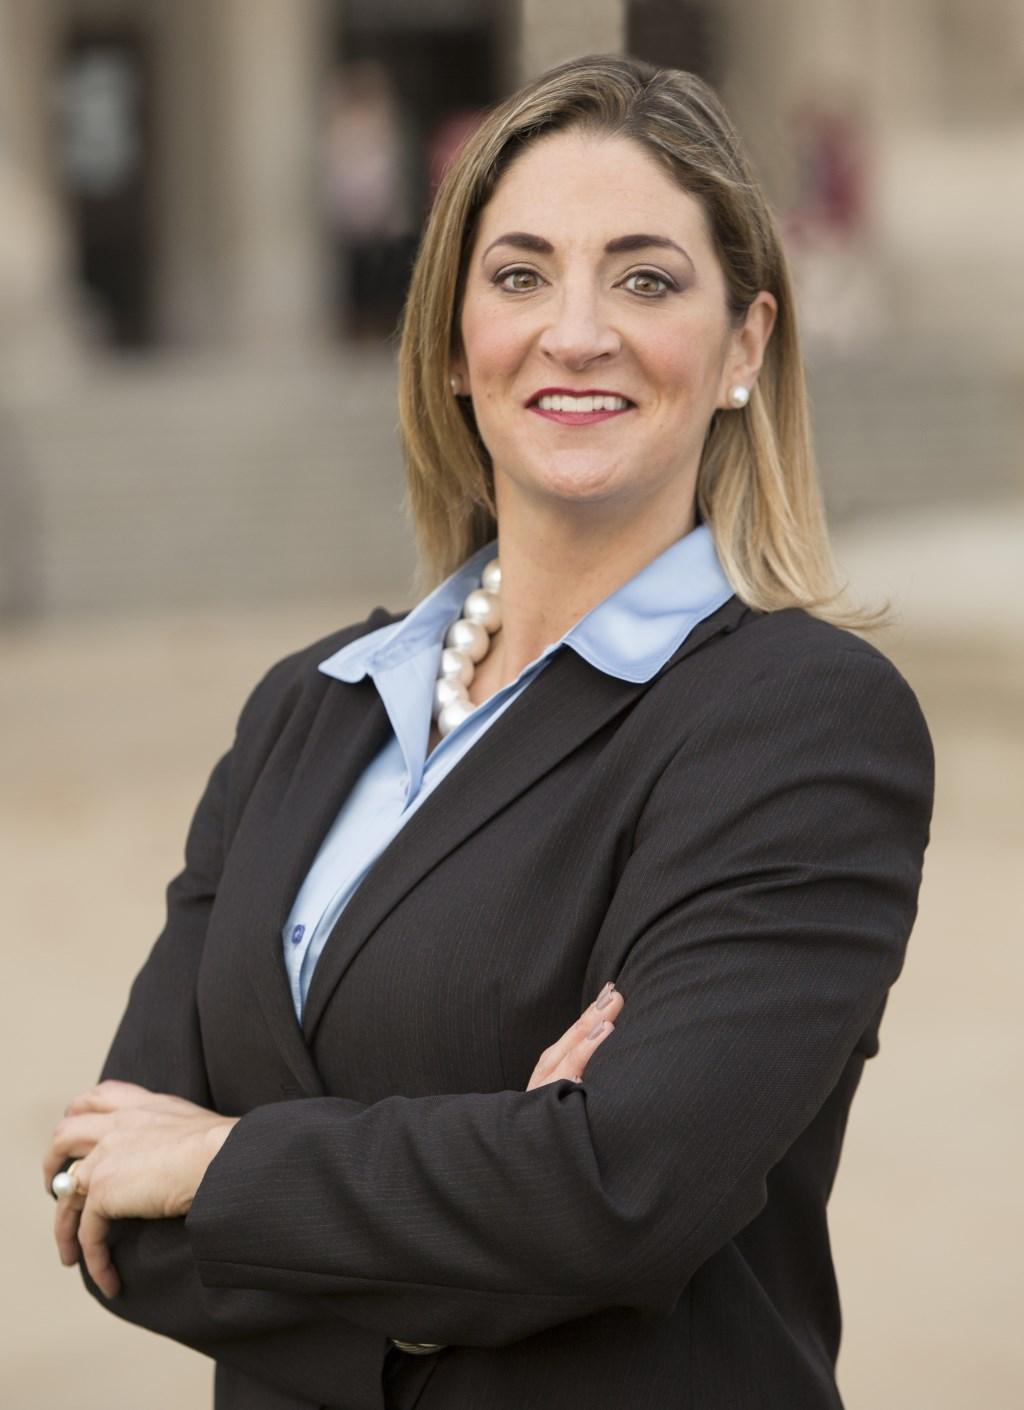 Find your employer-sponsored deferred compensation plan